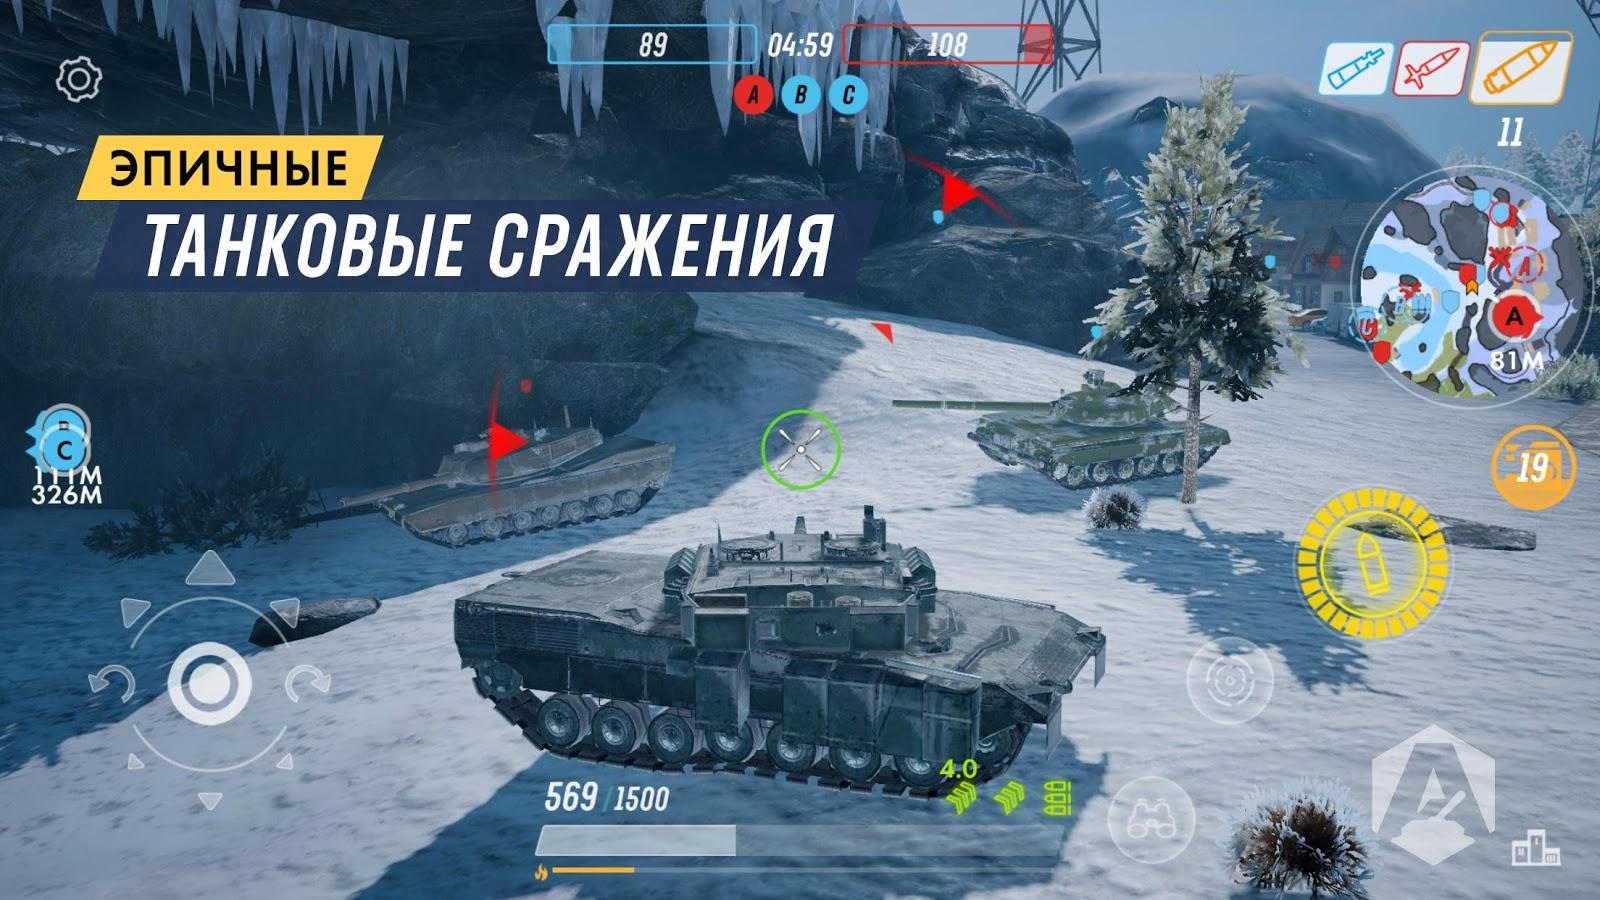 Обои трава, истребитель, танков, armored warfare, lav-300 картинки.